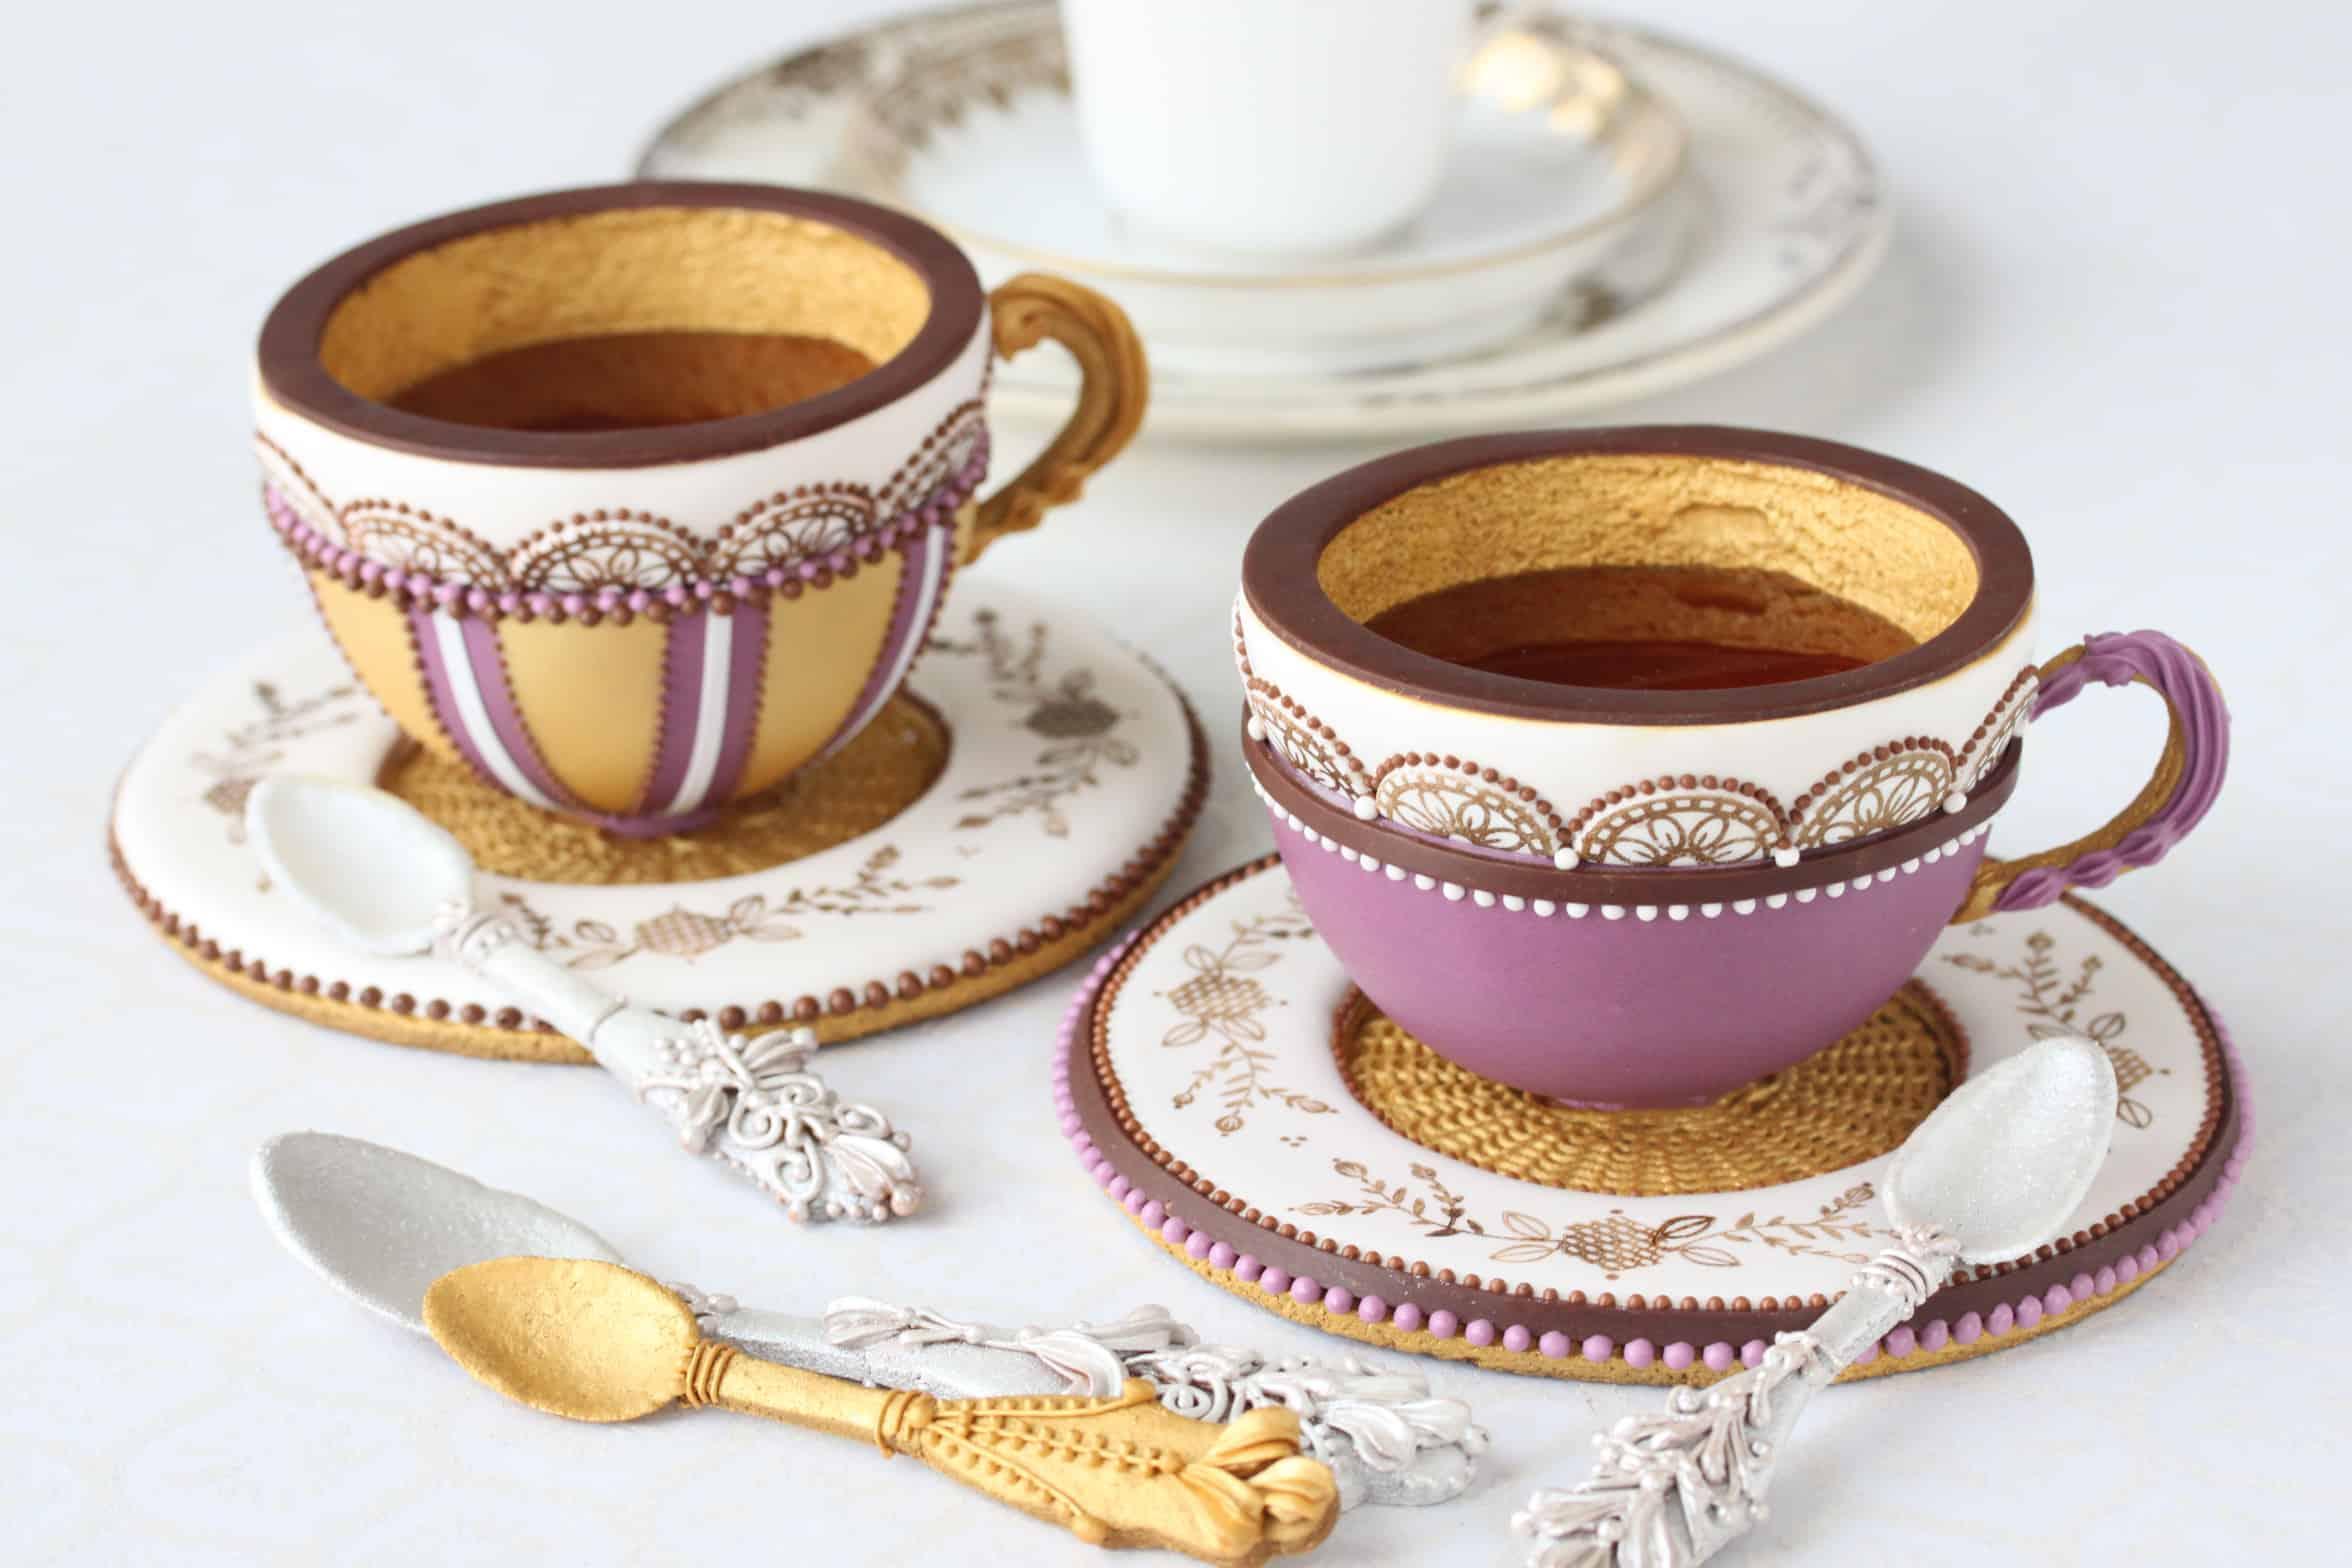 Teacup Cookies Insane Baking Creations